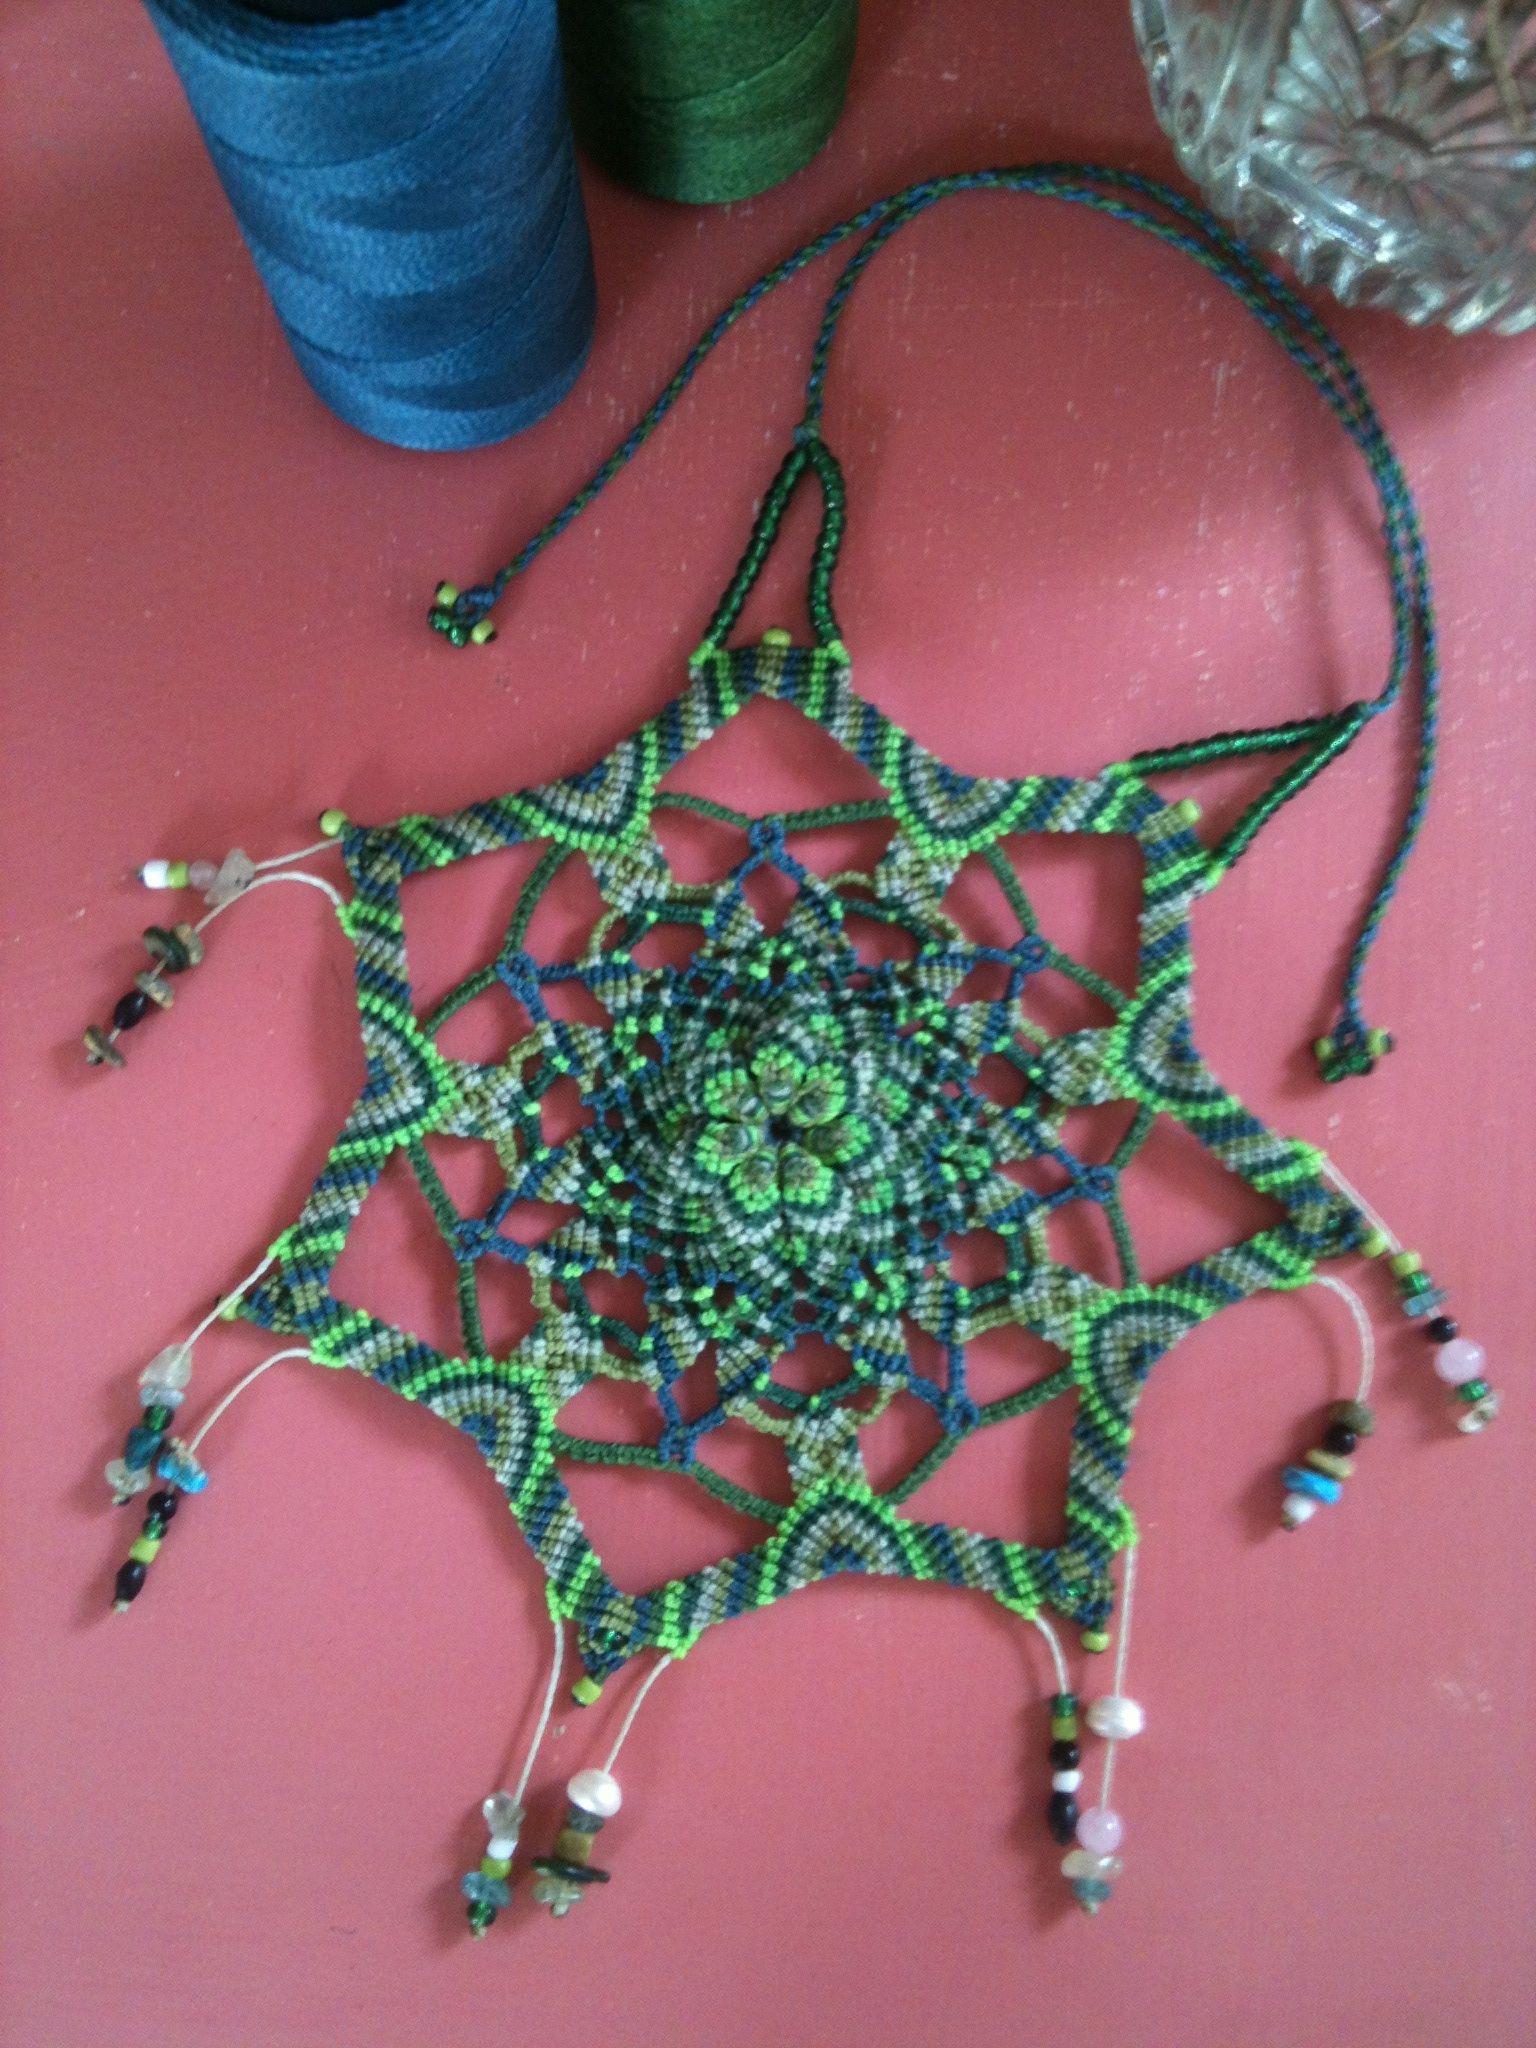 Macramé mandala for the heart chakra with pearl, blue apatite, rose quartz, prehnite, serpentine. Only took 7hours to make!! :)